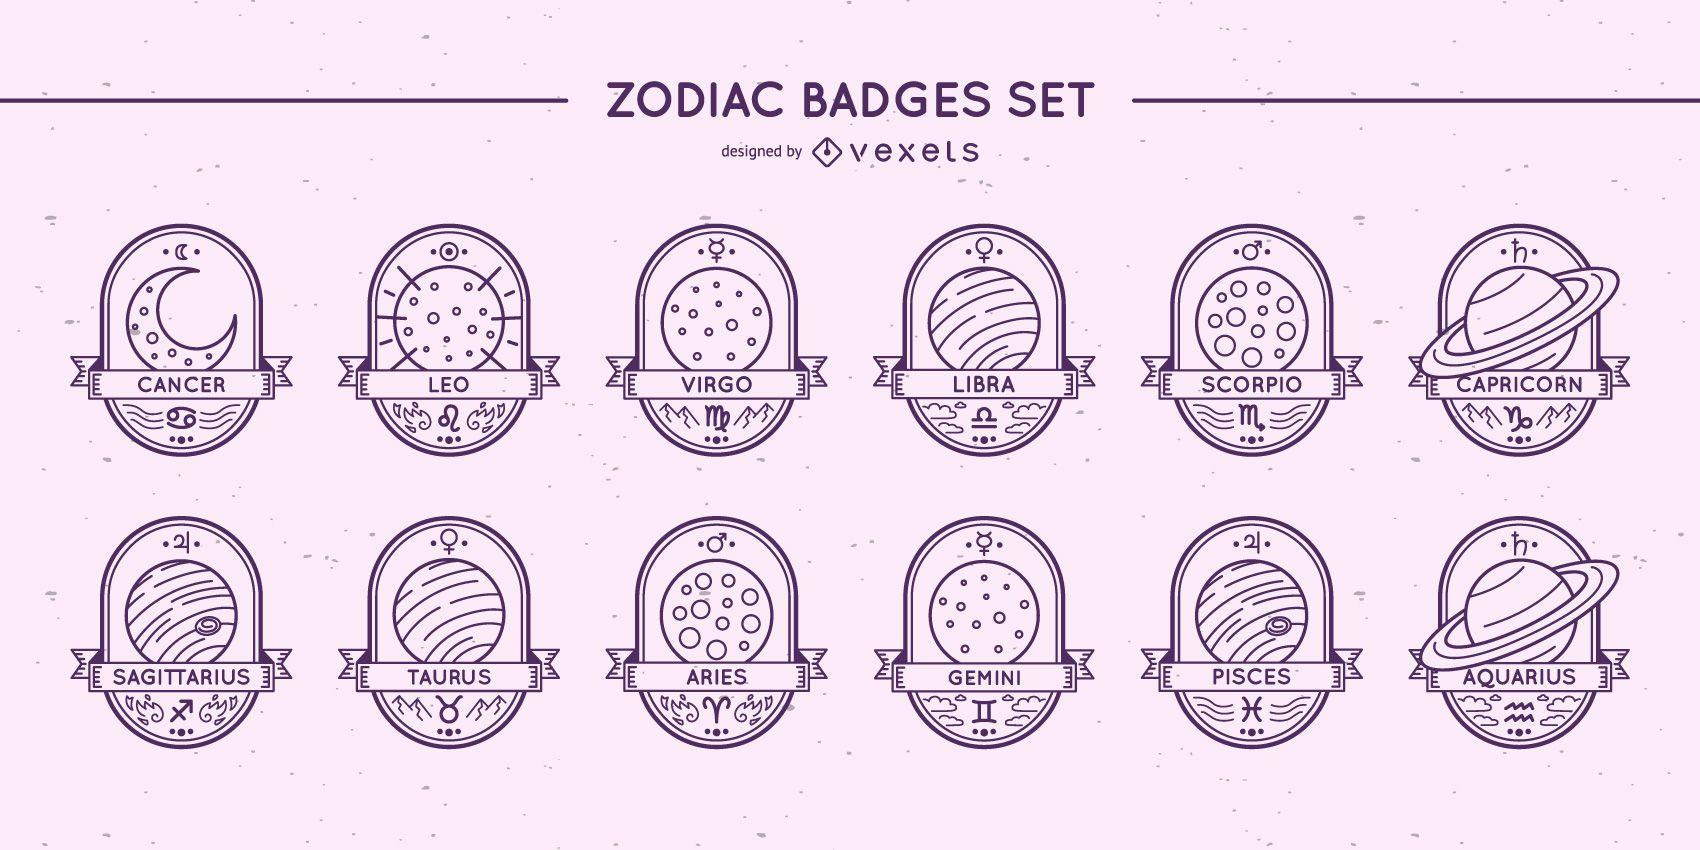 Zodiac badges planets set